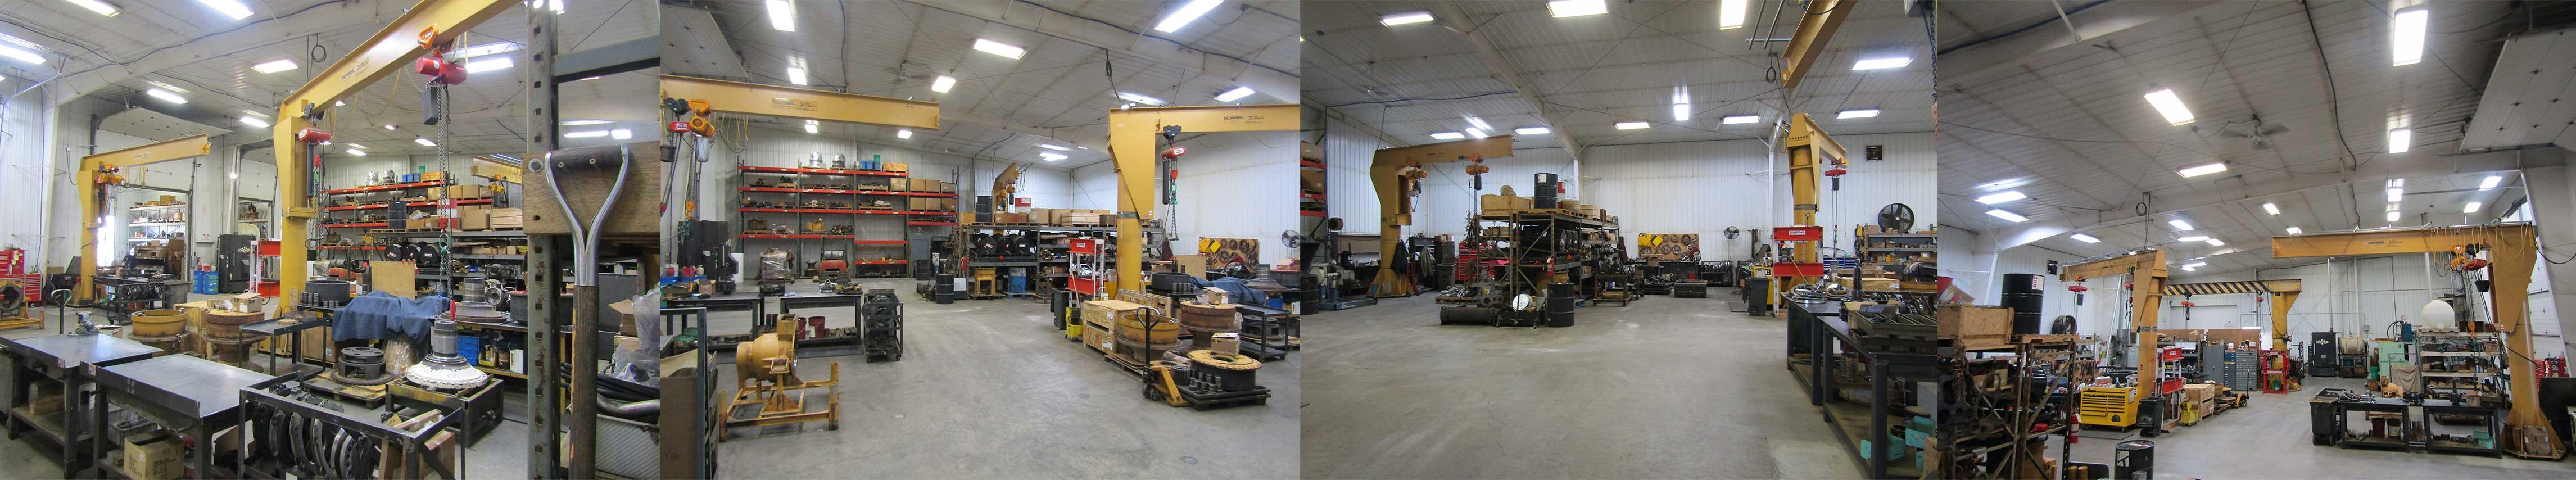 Rebuild | Yellowstone Valley Parts & Equipment | Billings, MT | We